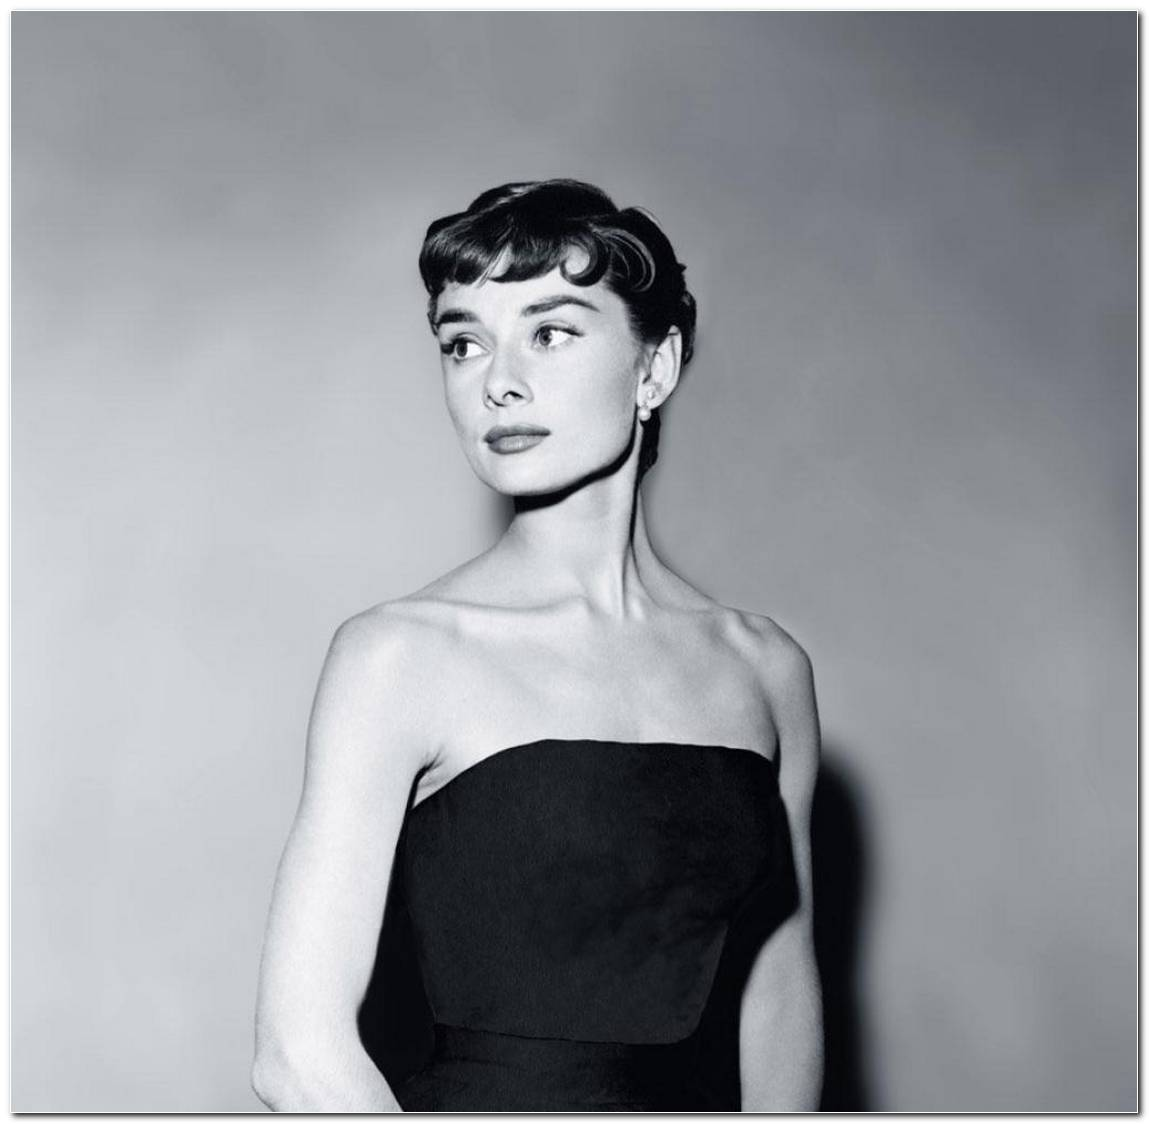 Frisur Audrey Hepburn Kurz